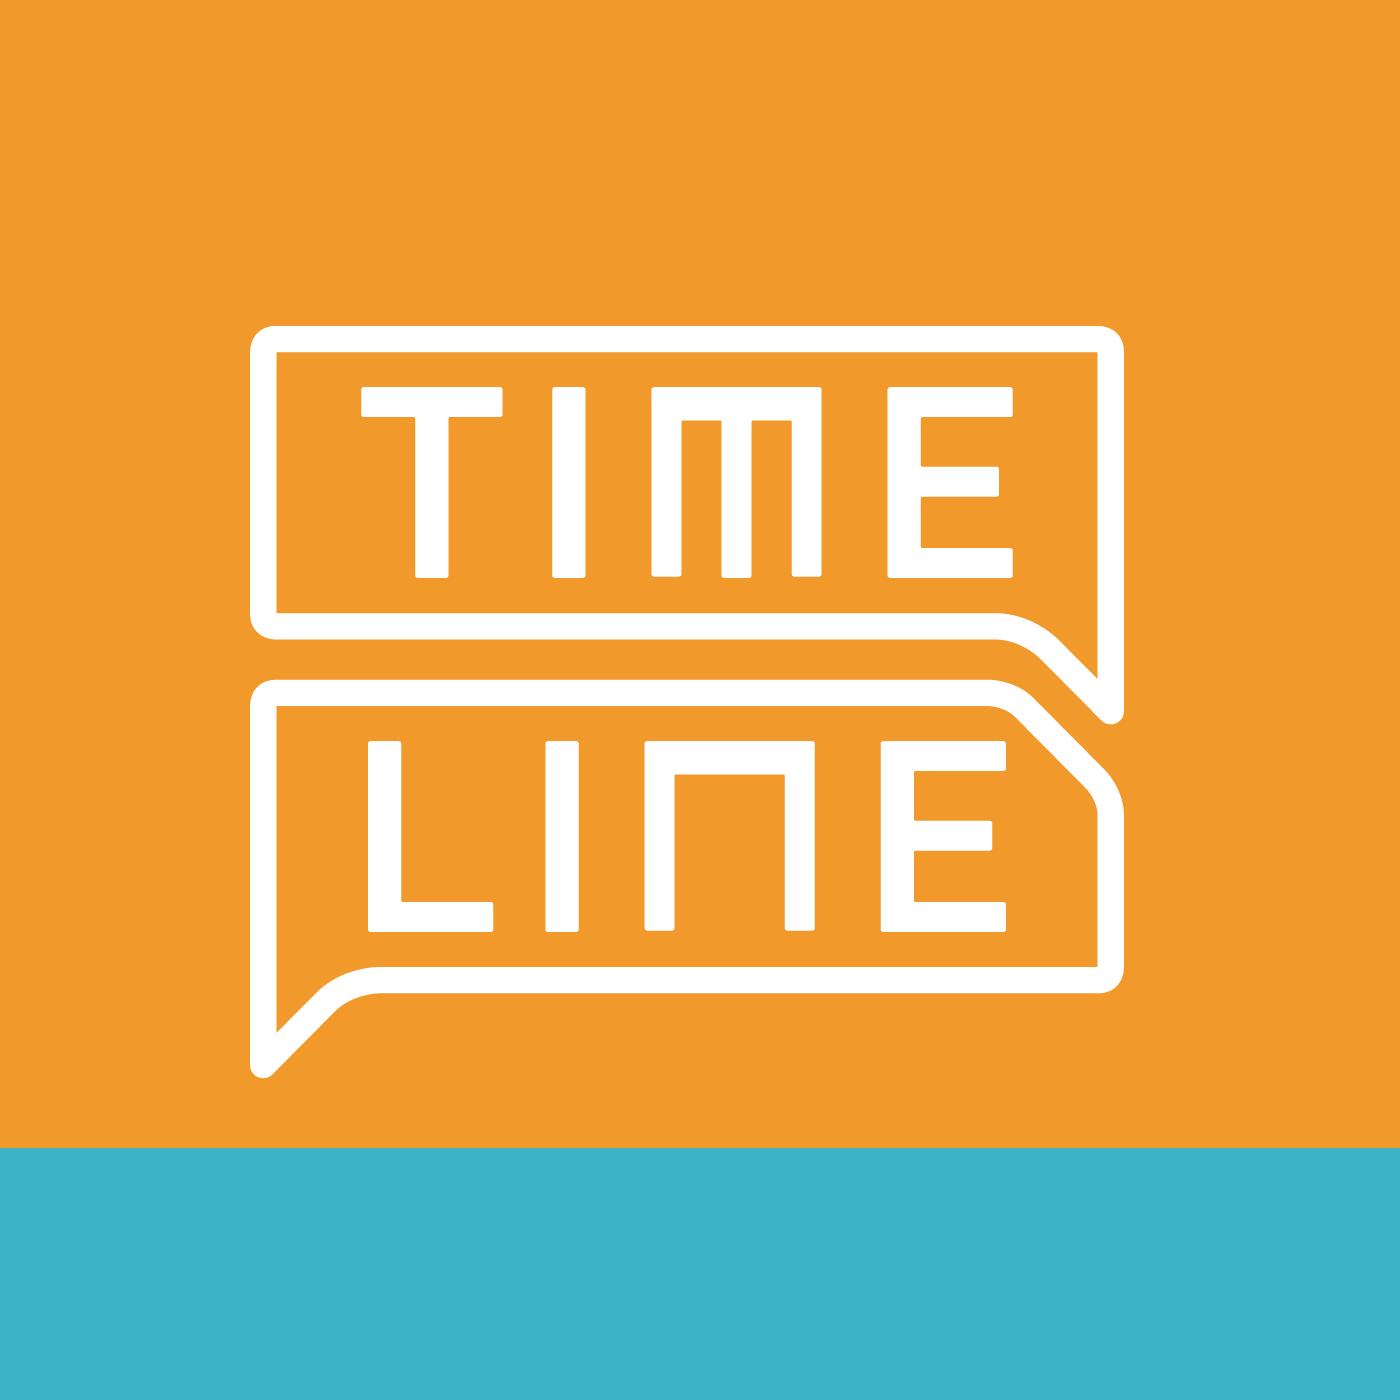 Timeline Gaúcha 25/04/2017